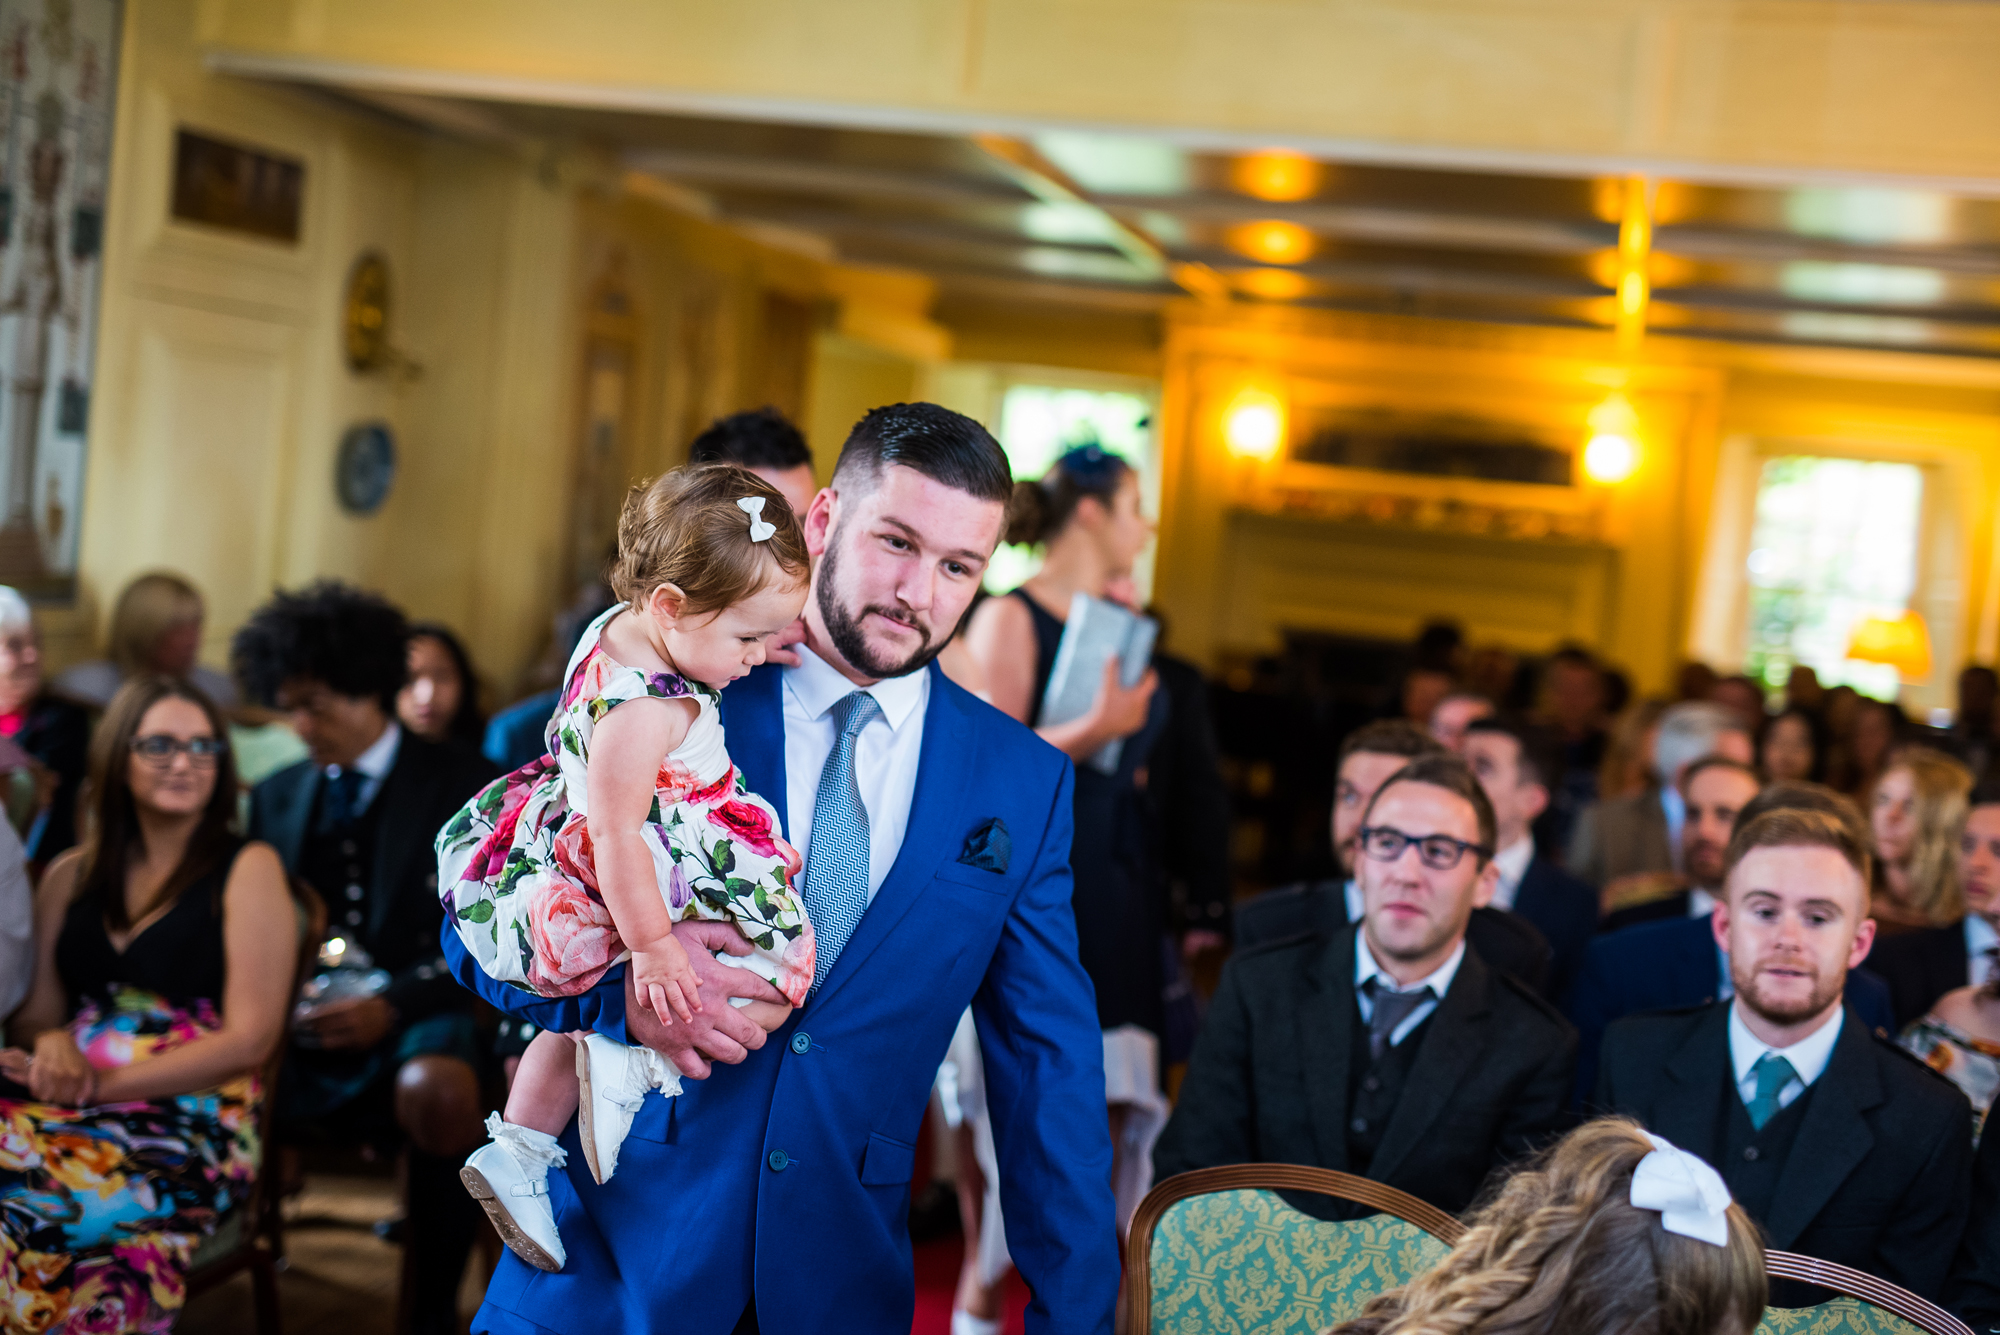 Kev and Shrabani wedding photos (100 of 350).jpg